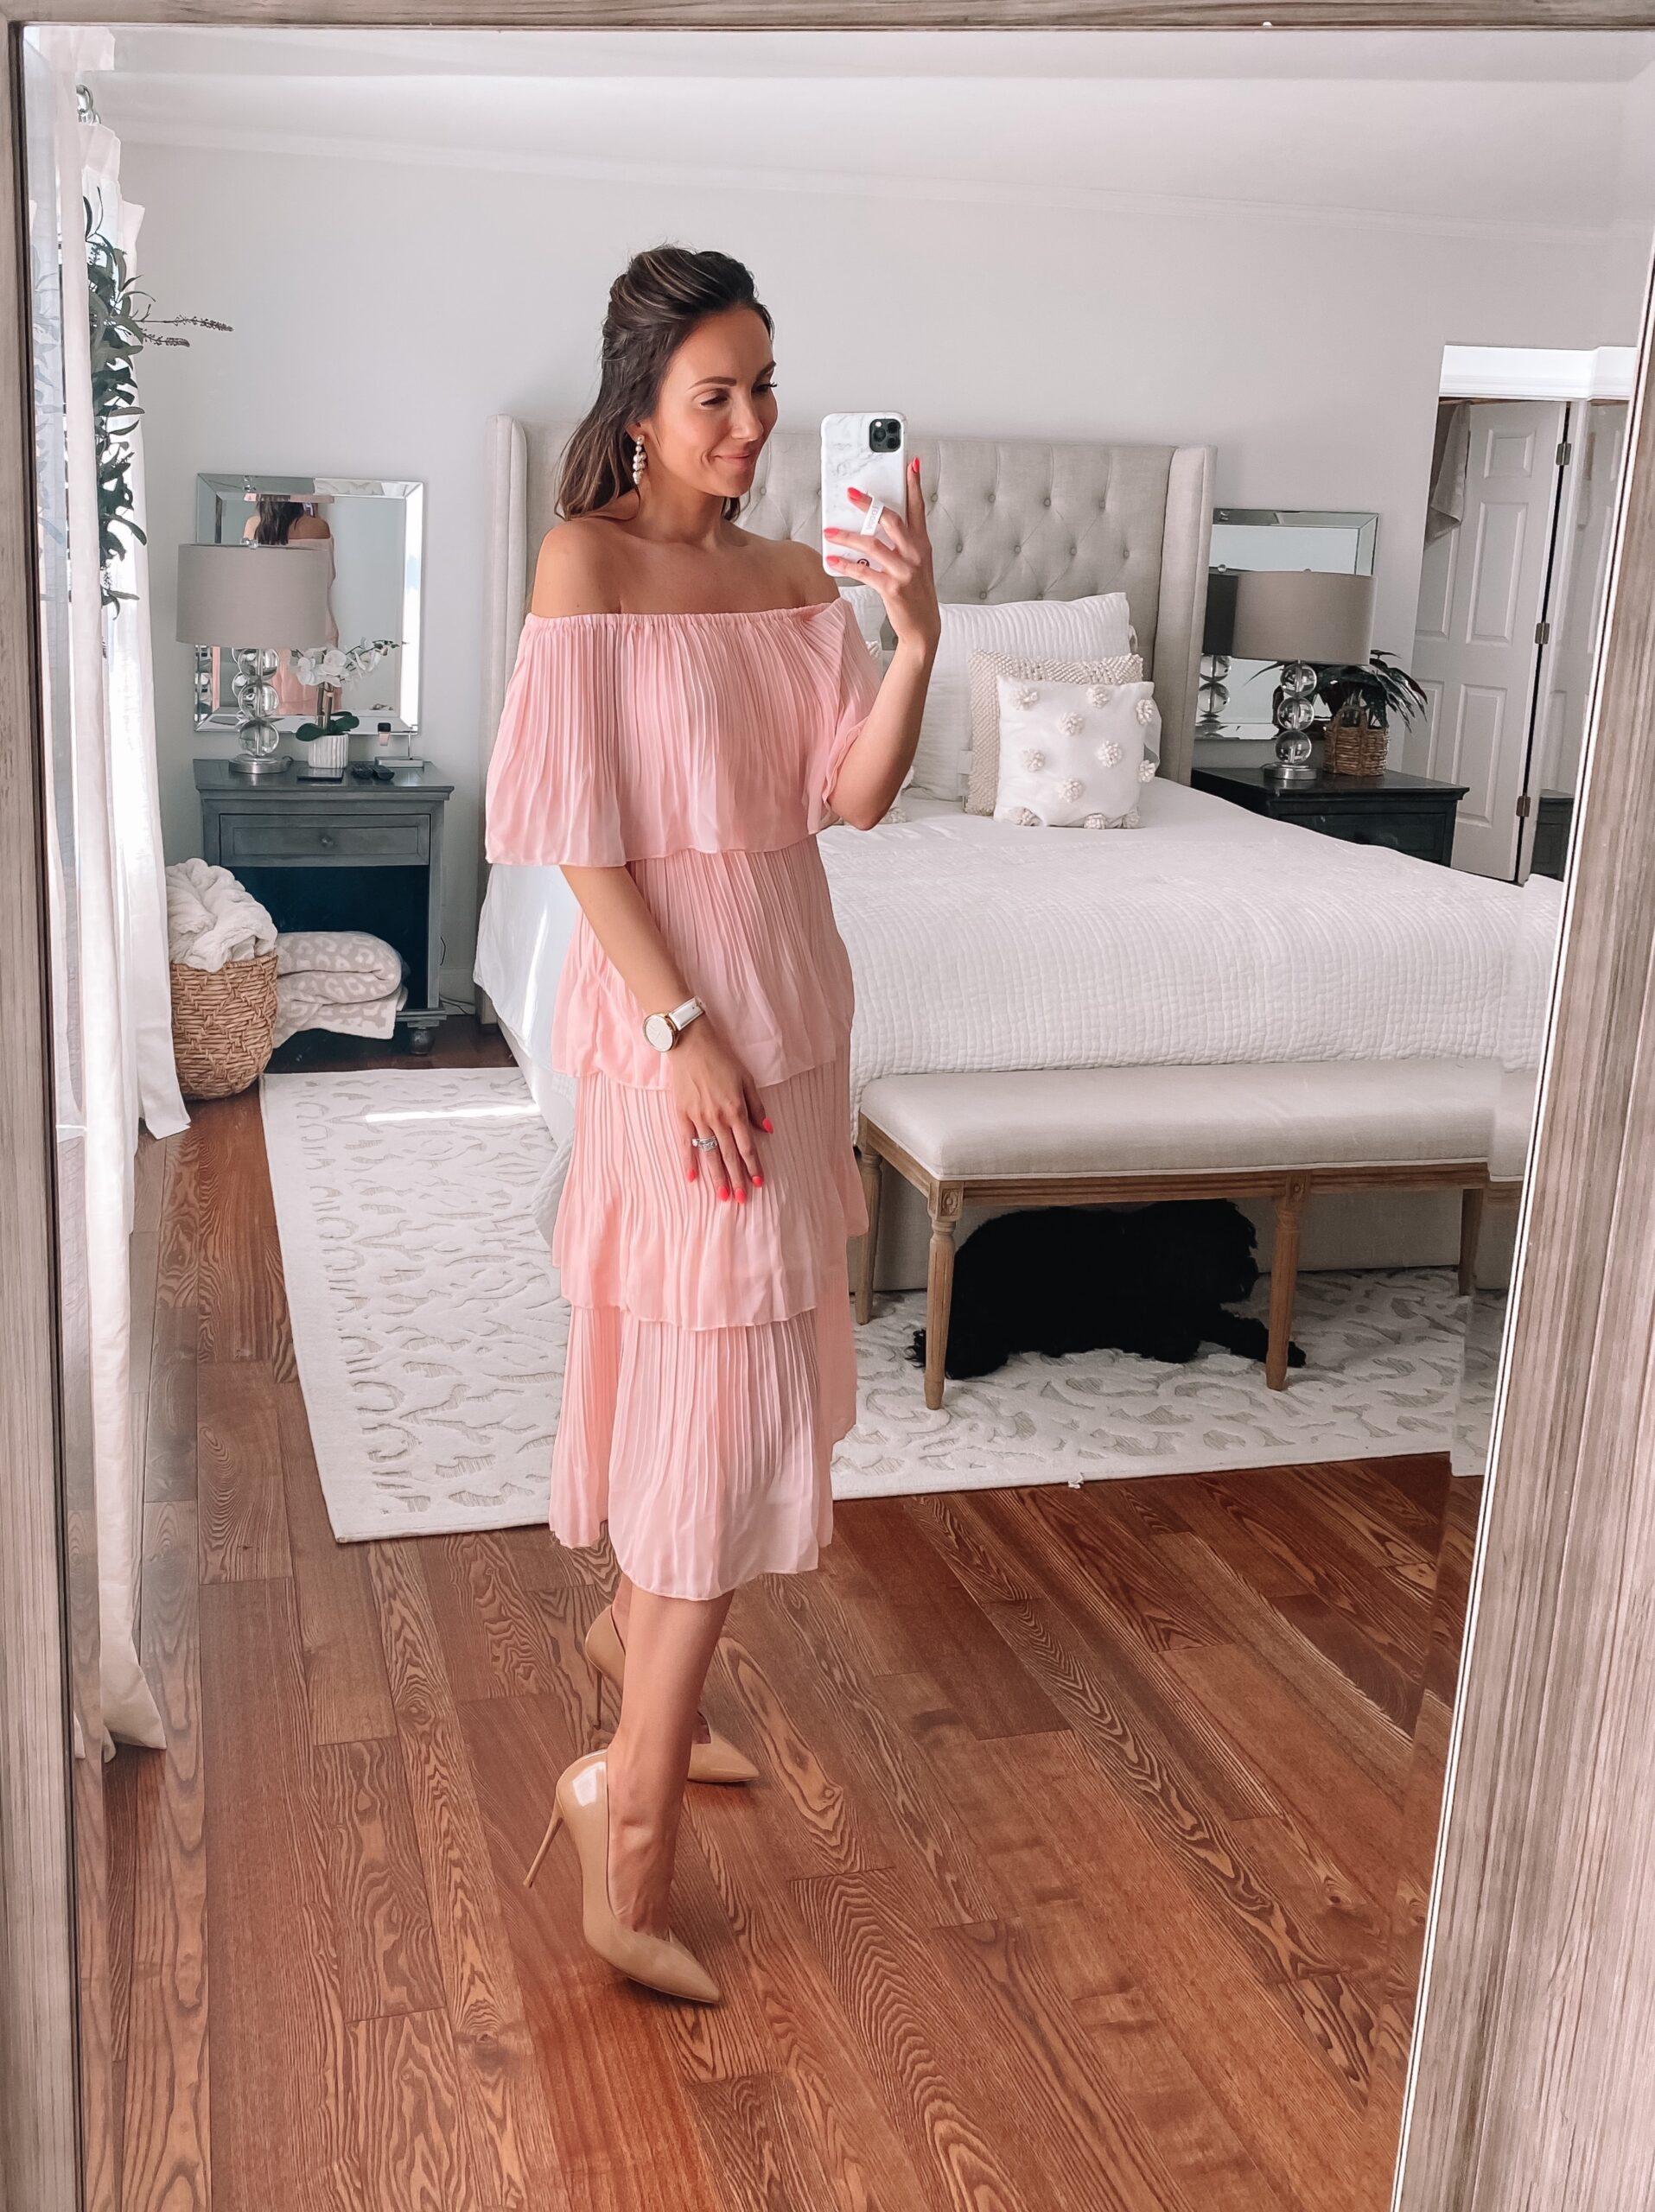 amazon pink dress, wedding guest dress